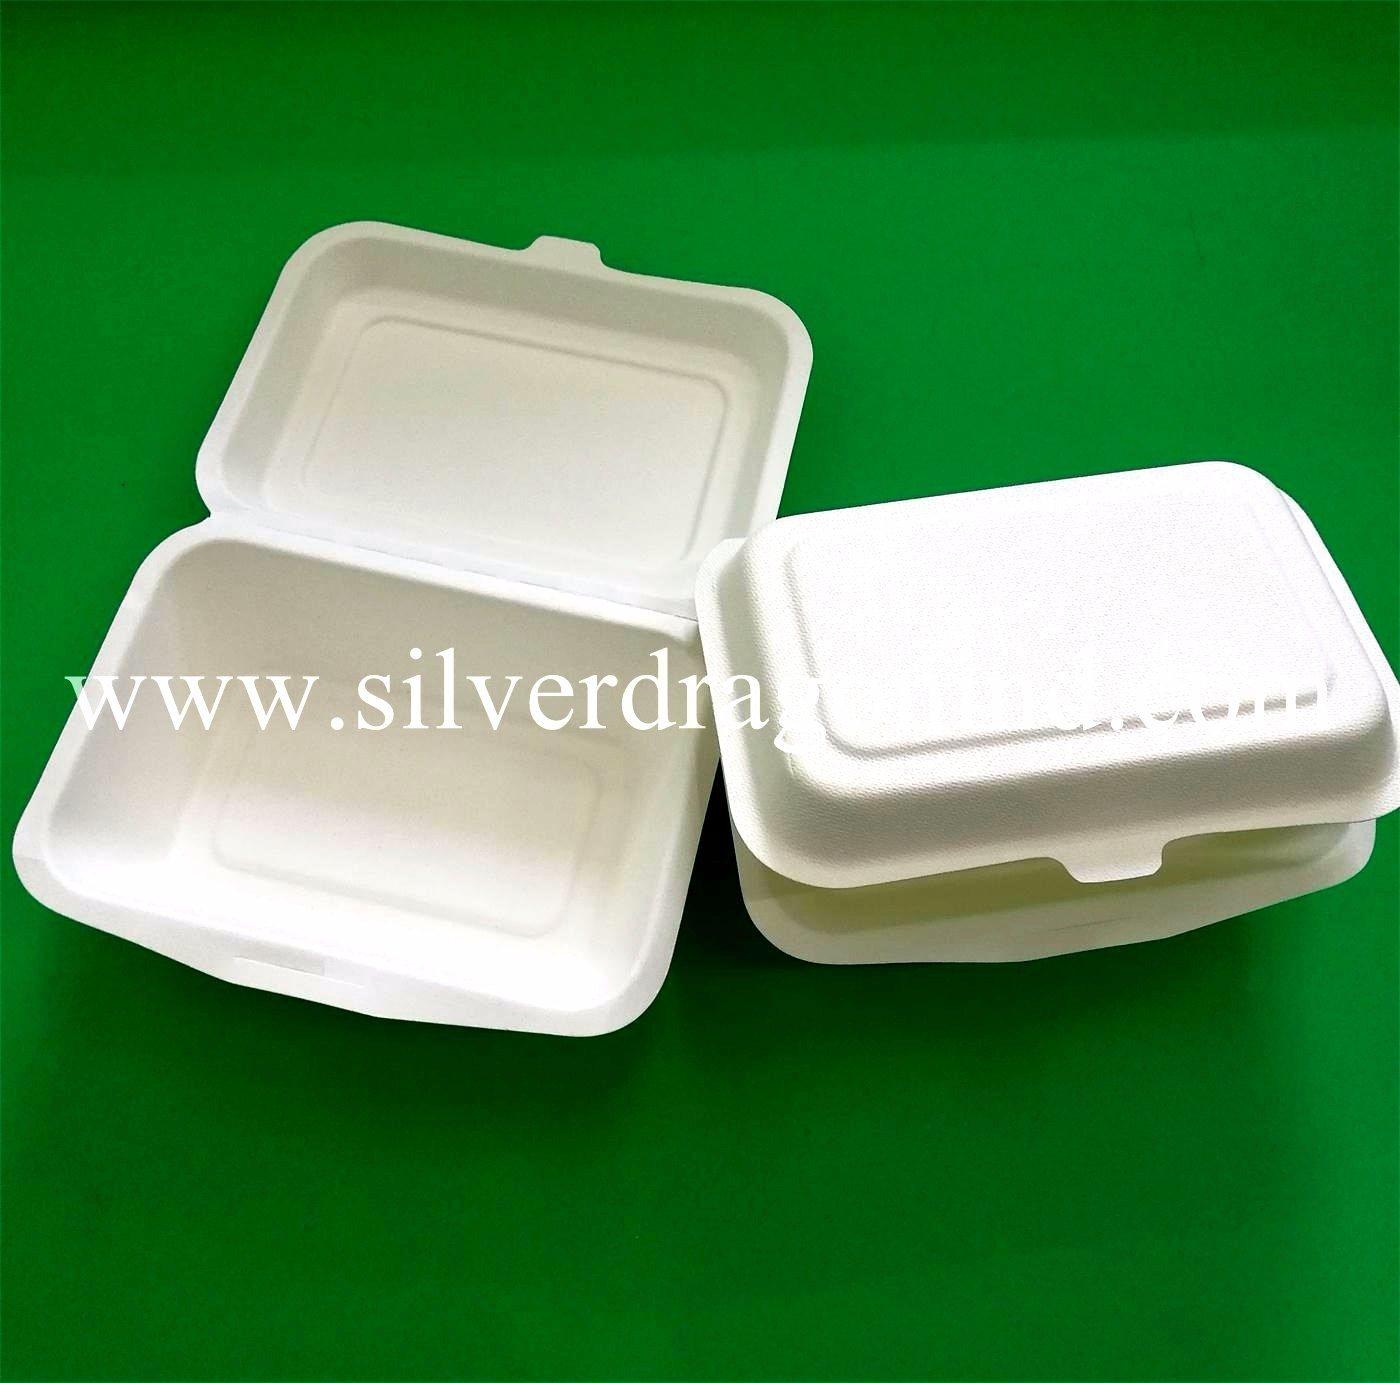 Compostable Biodegradable Tableware Sugarcane Bagasse Paper Clamshell